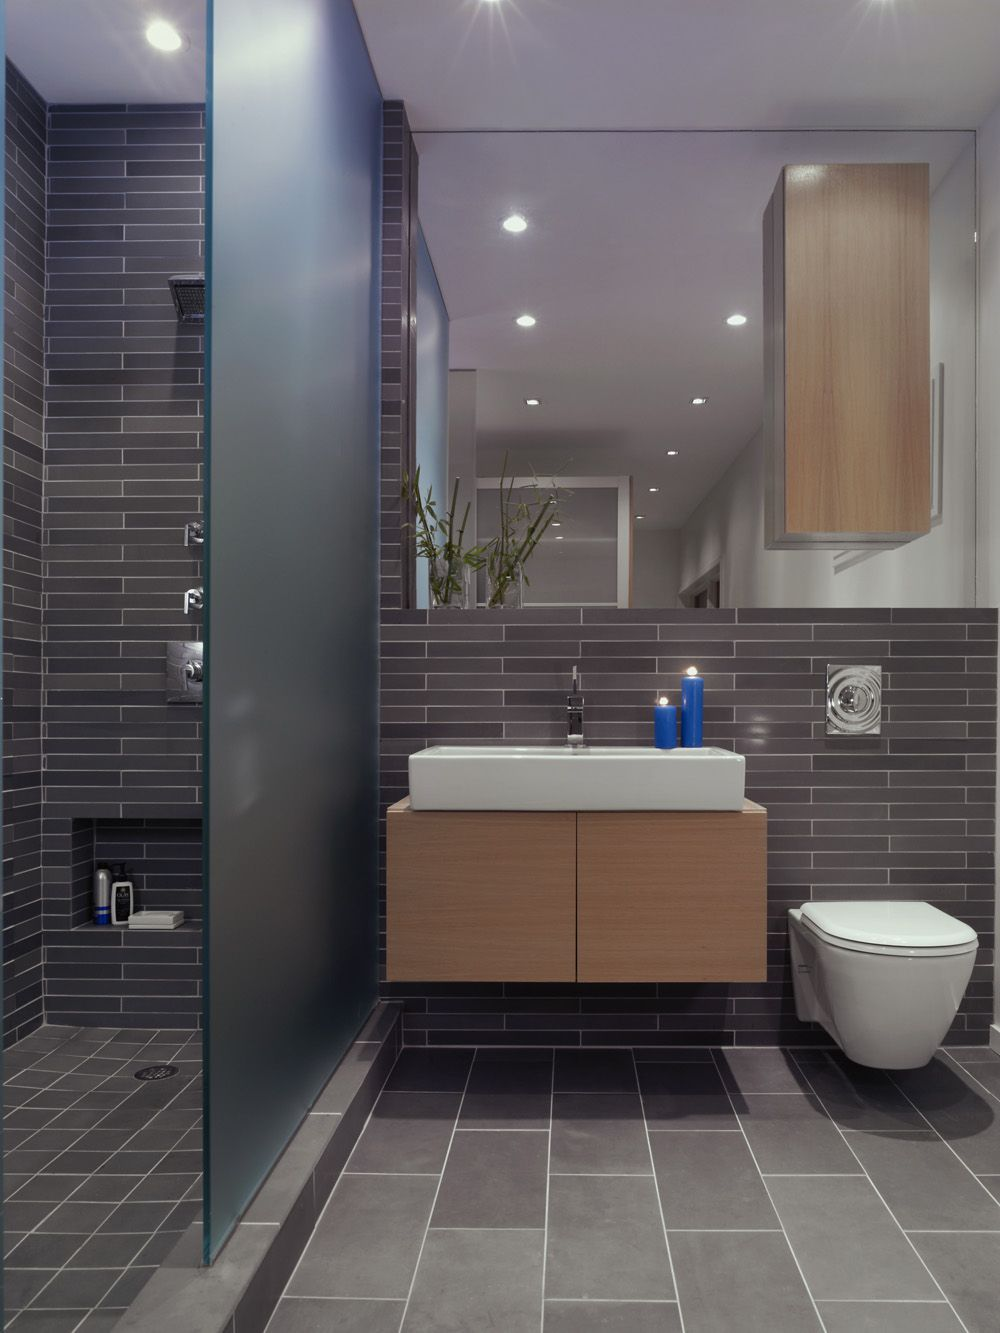 Dark Tiles Bathroom Design Small Modern Modern Small Bathrooms Bathroom Design Small